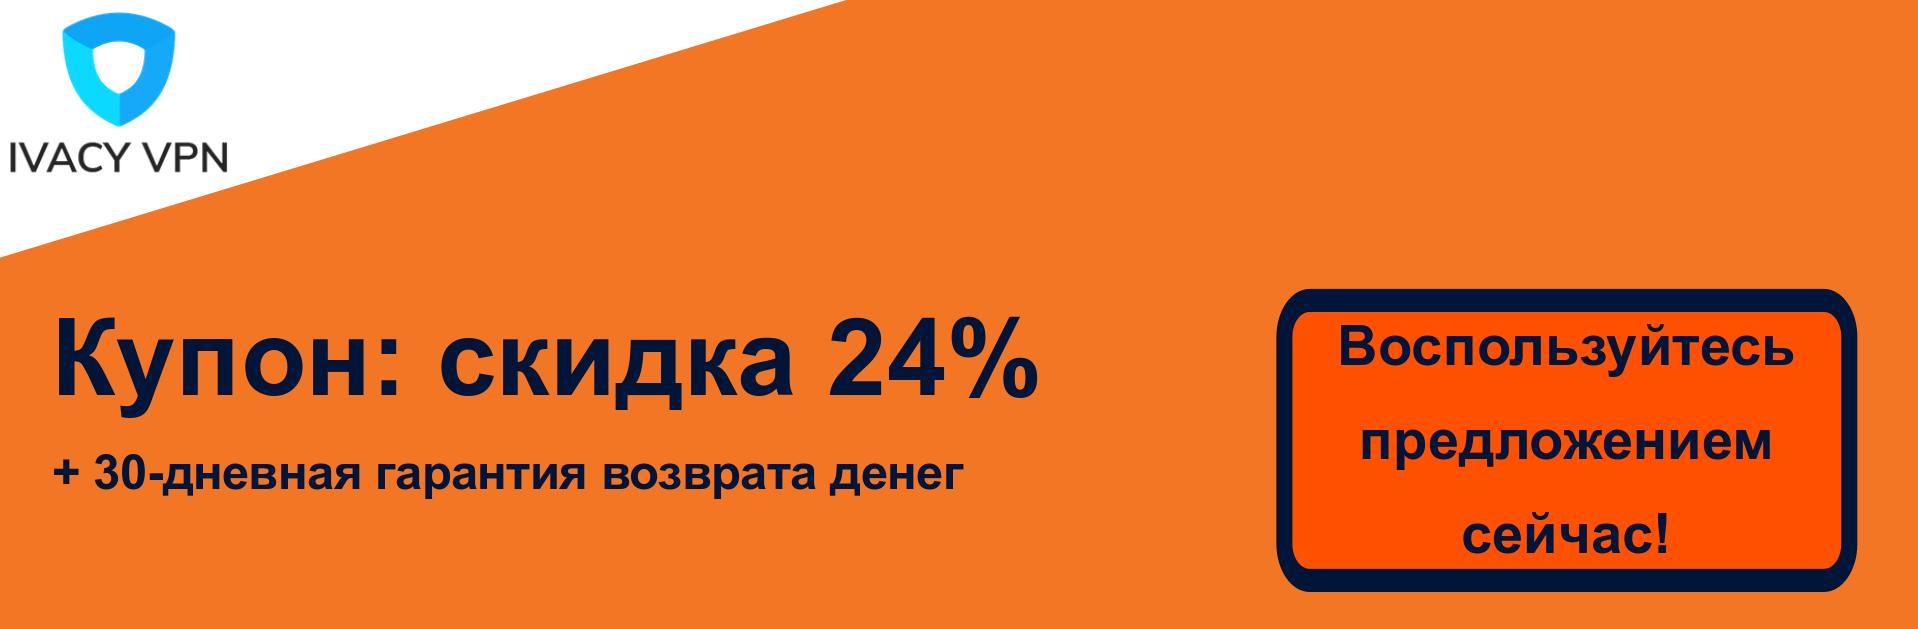 Ivacy VPN купон баннер - скидка 24%